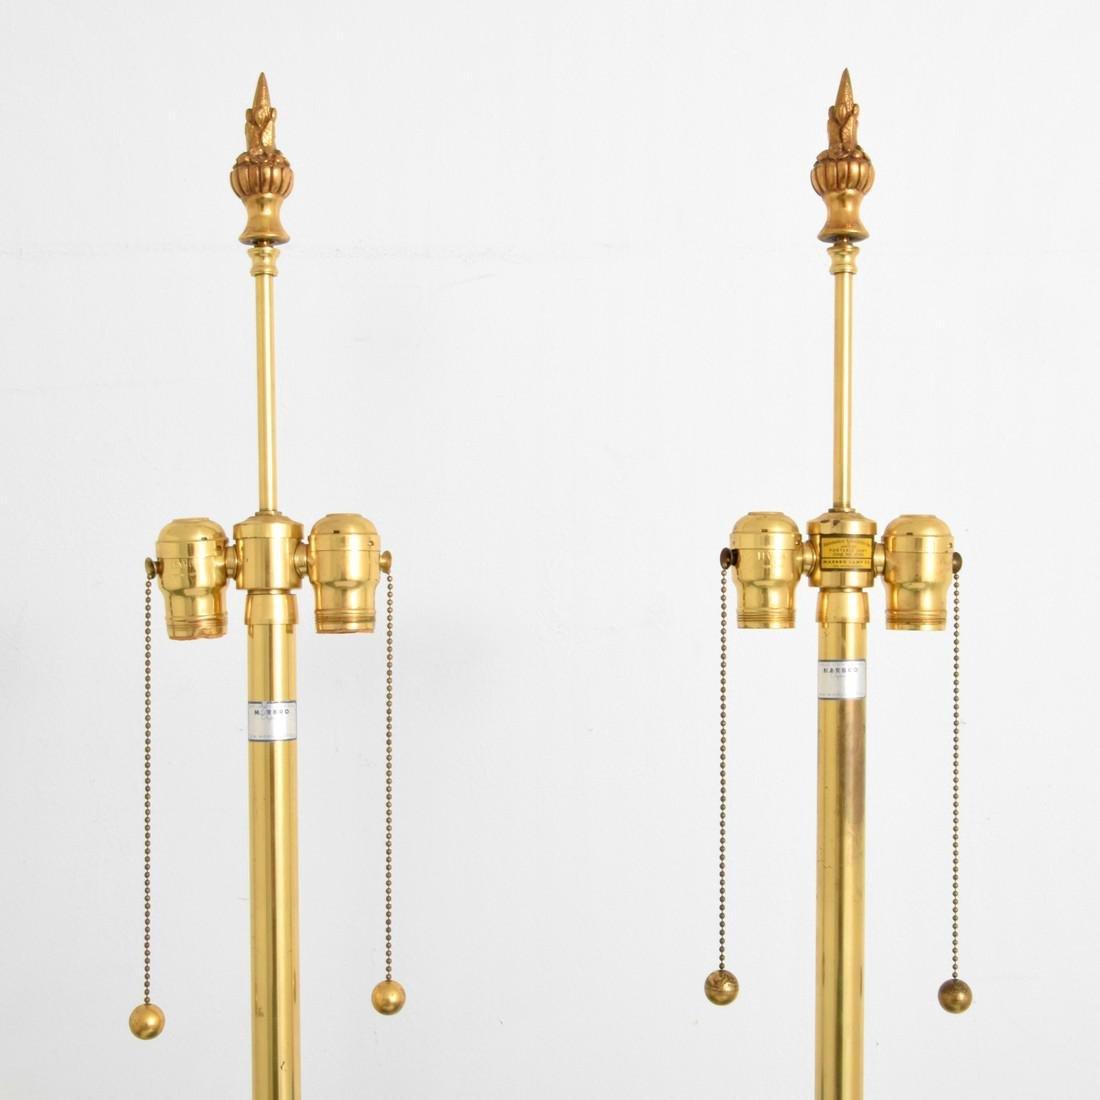 Pair of Monumental Marbro Lamp Co. Lamps - 3